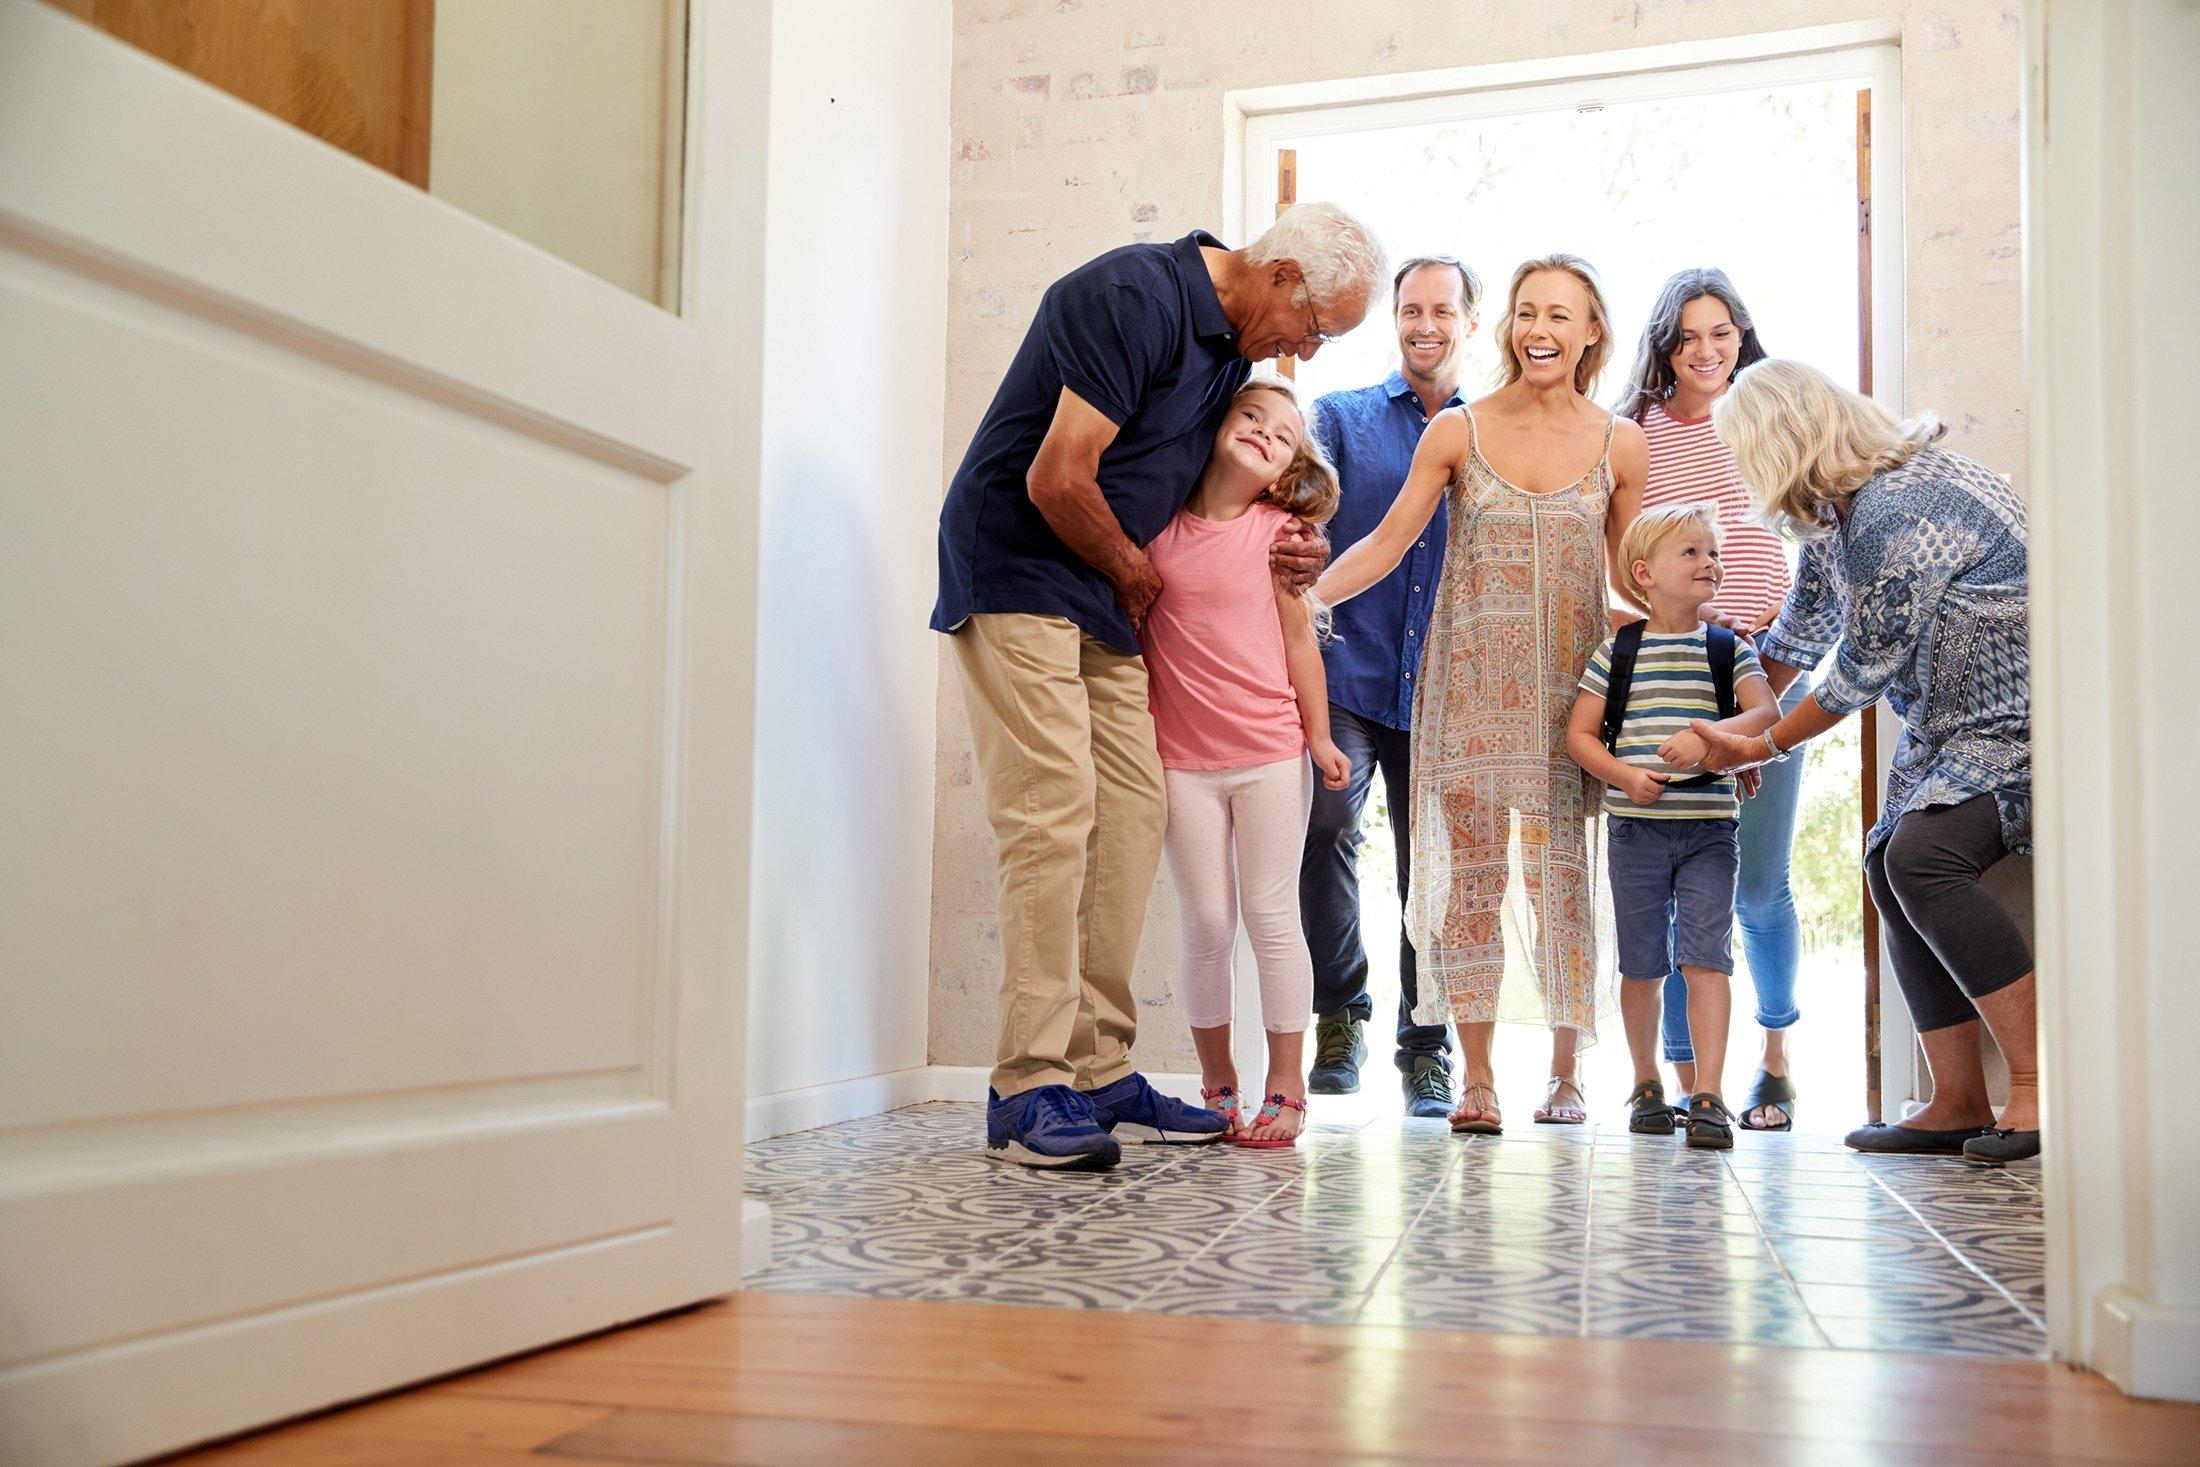 Anak-anak mengunjungi kakek-nenek mereka bersama keluarga mereka.  (Foto Shutterstock)